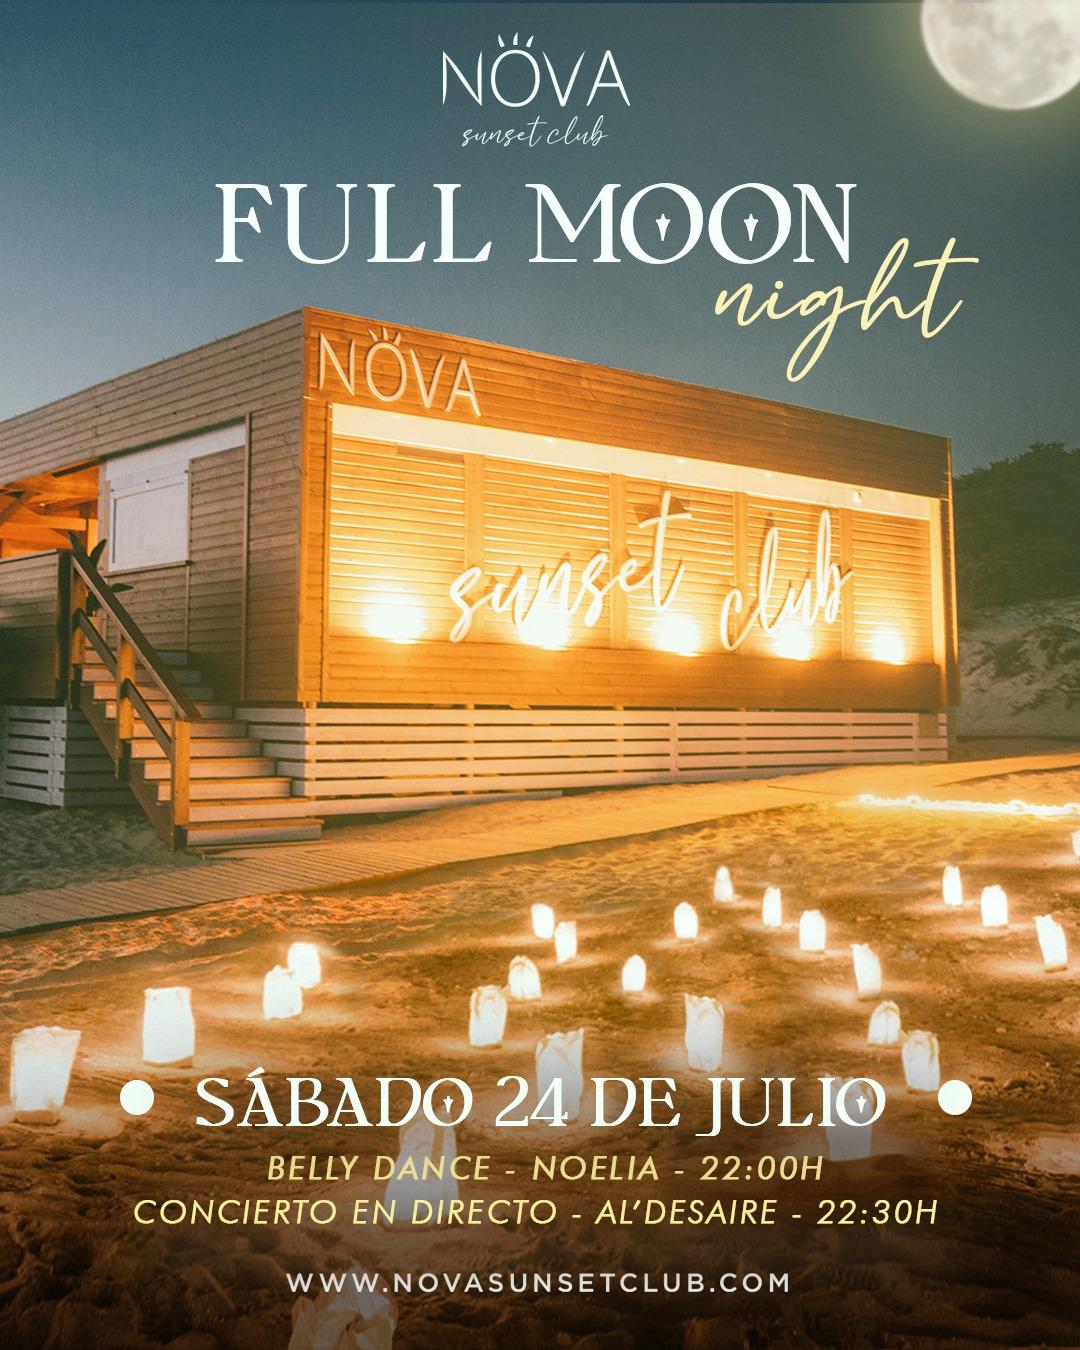 Full Moon Night en Nova Sunset Club